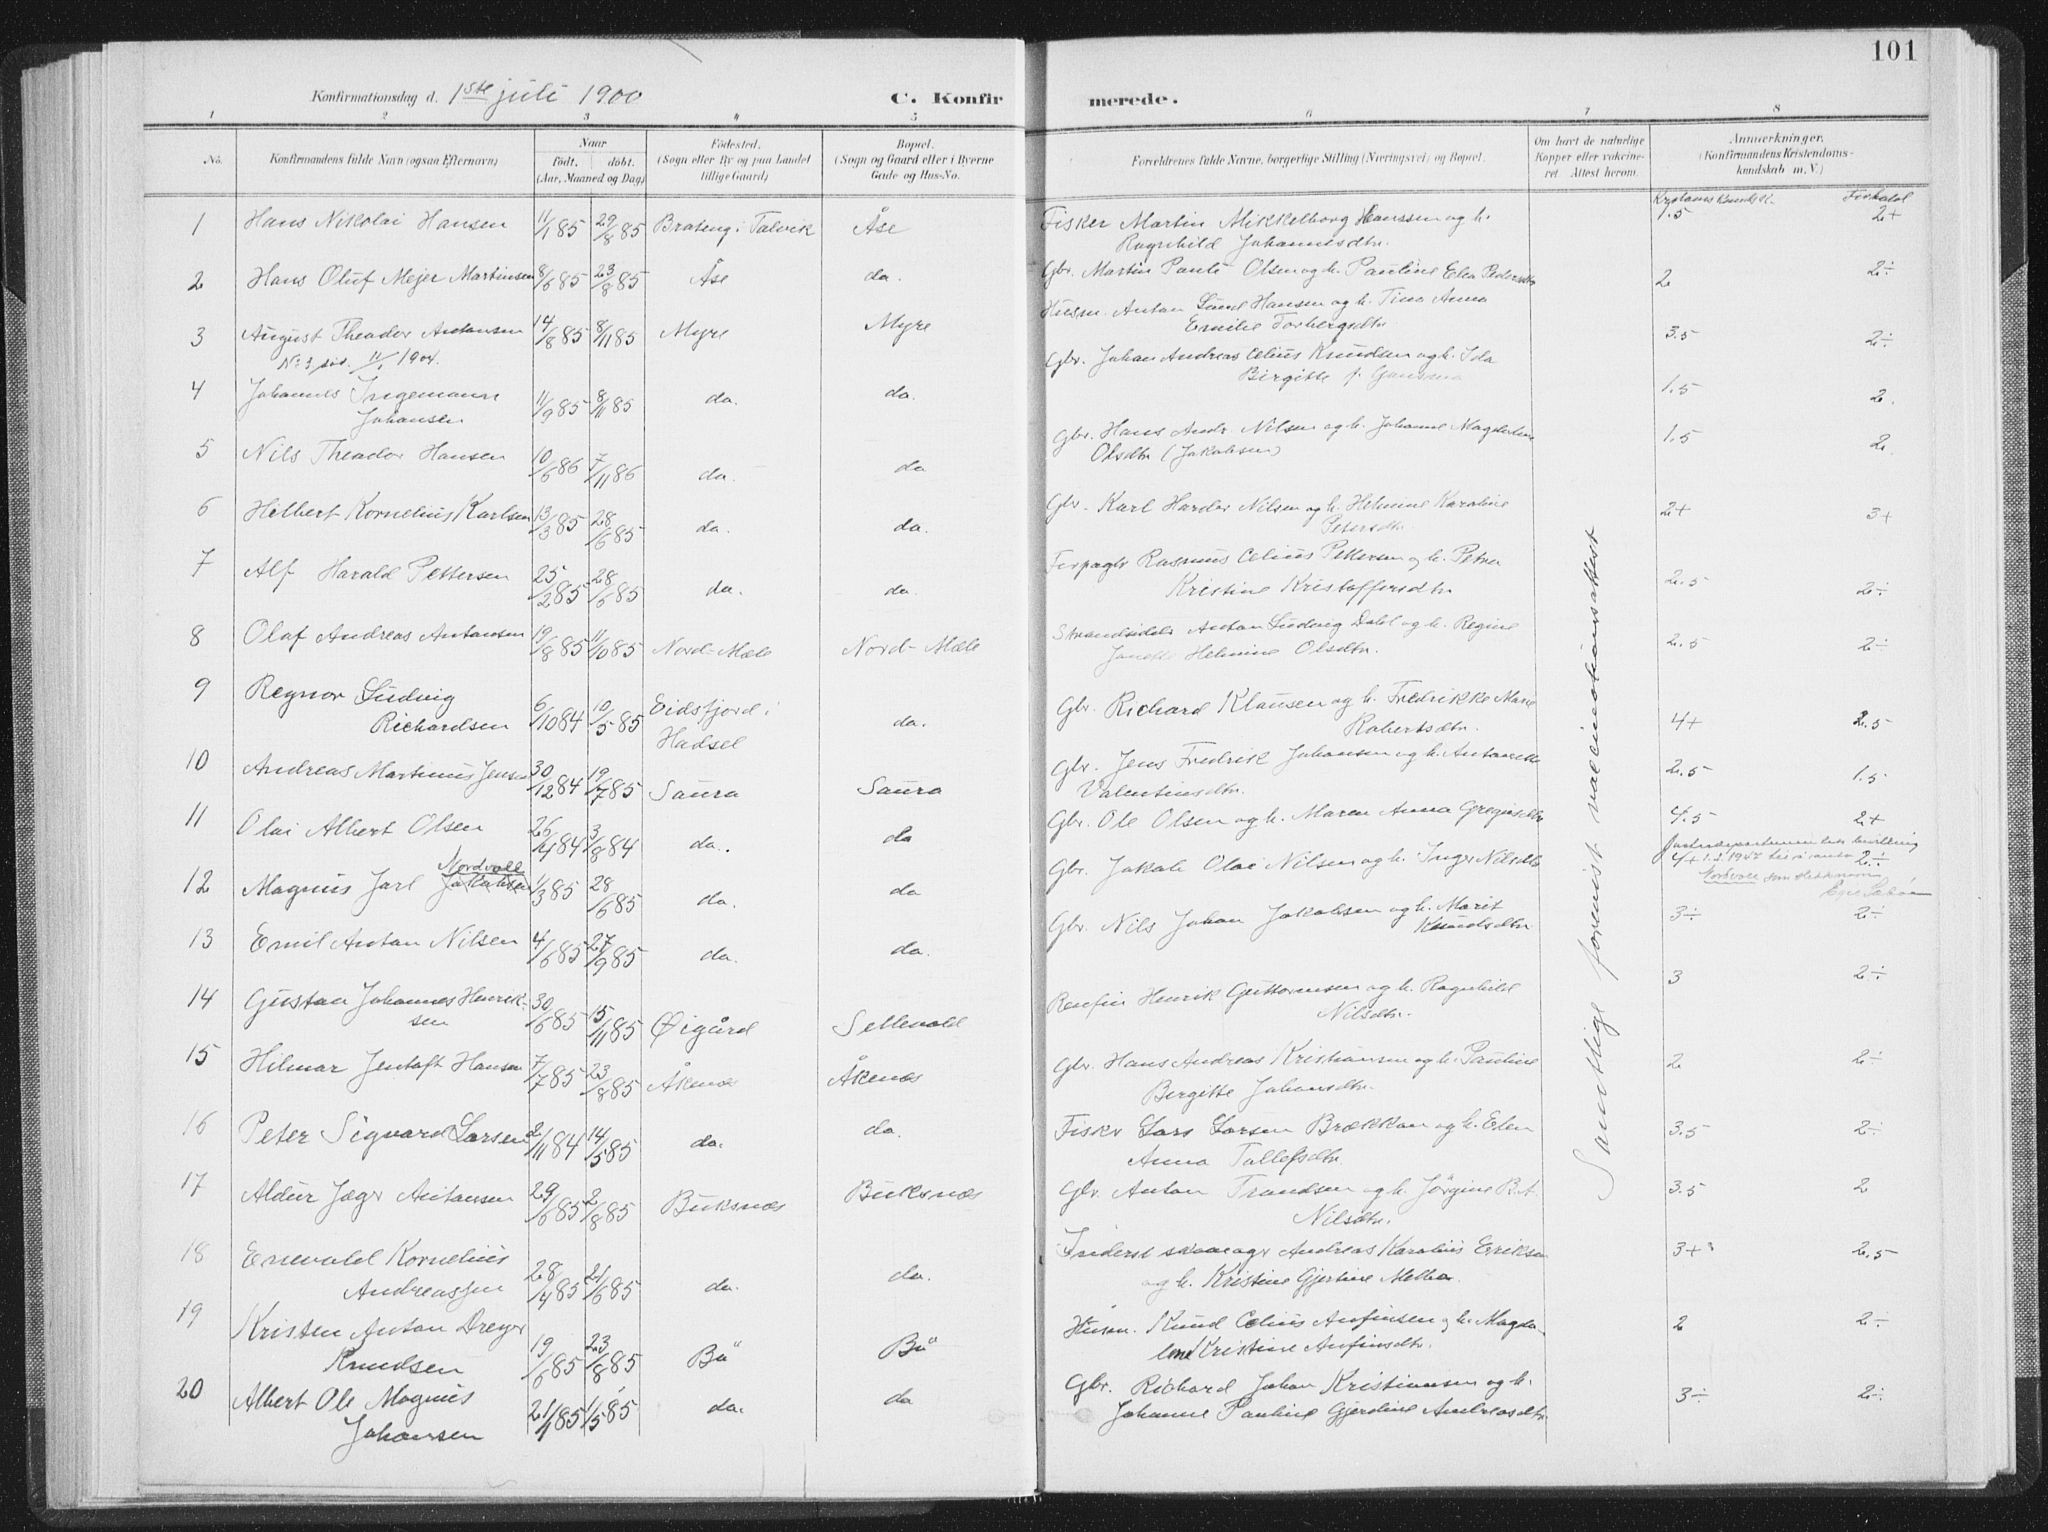 SAT, Ministerialprotokoller, klokkerbøker og fødselsregistre - Nordland, 897/L1400: Ministerialbok nr. 897A07, 1897-1908, s. 101